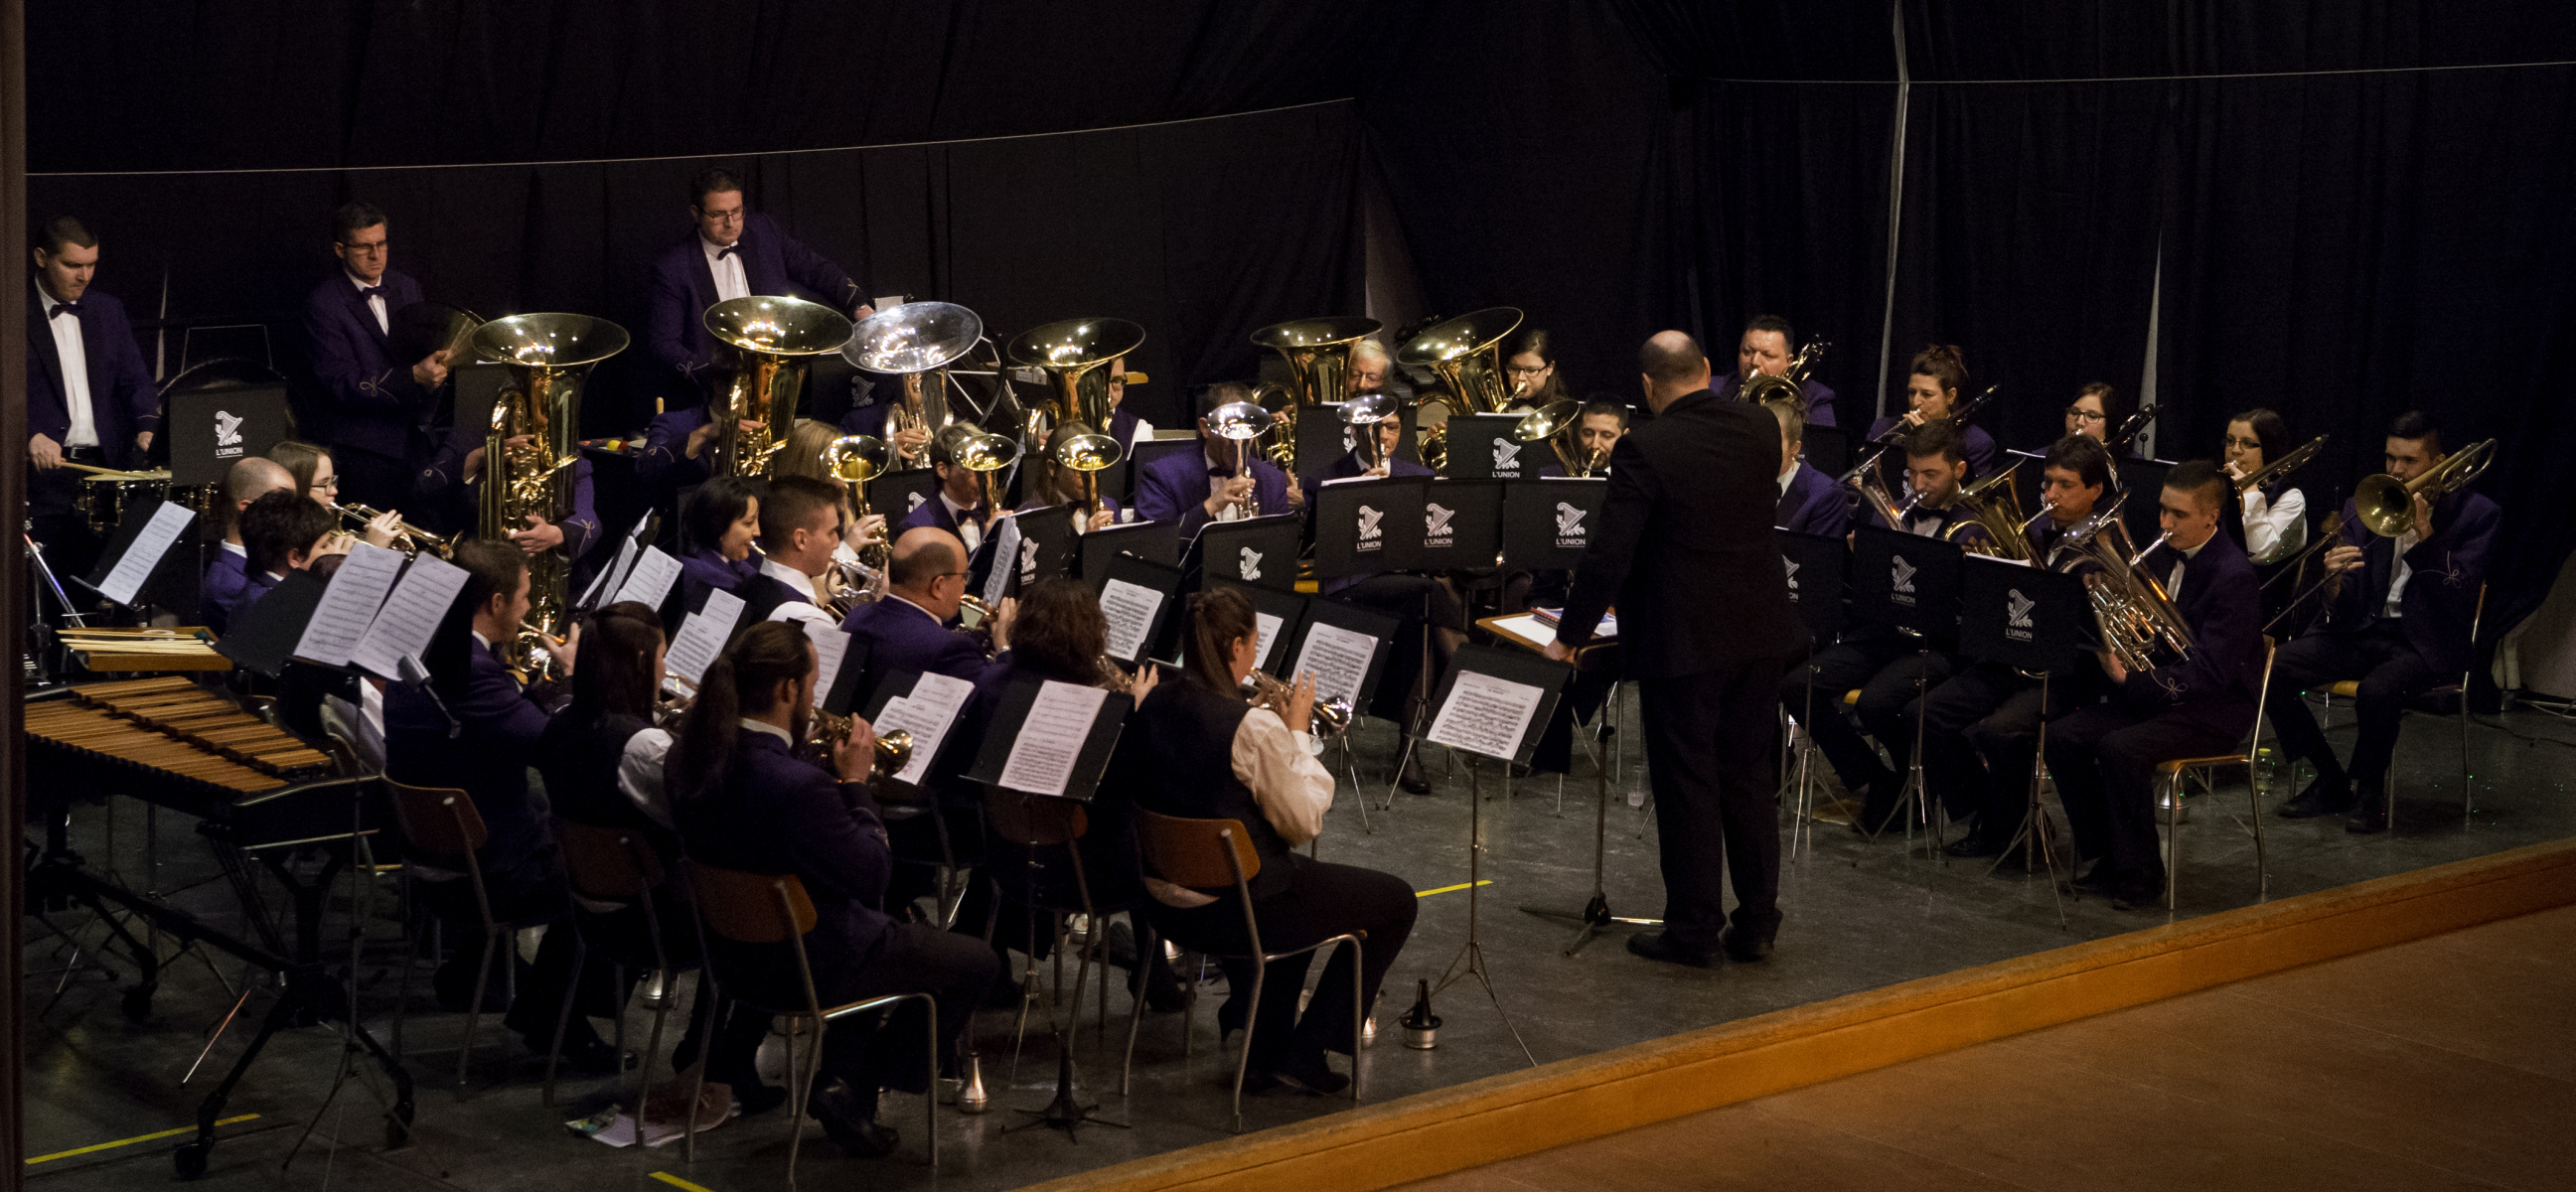 170211_concert_annuel17-051